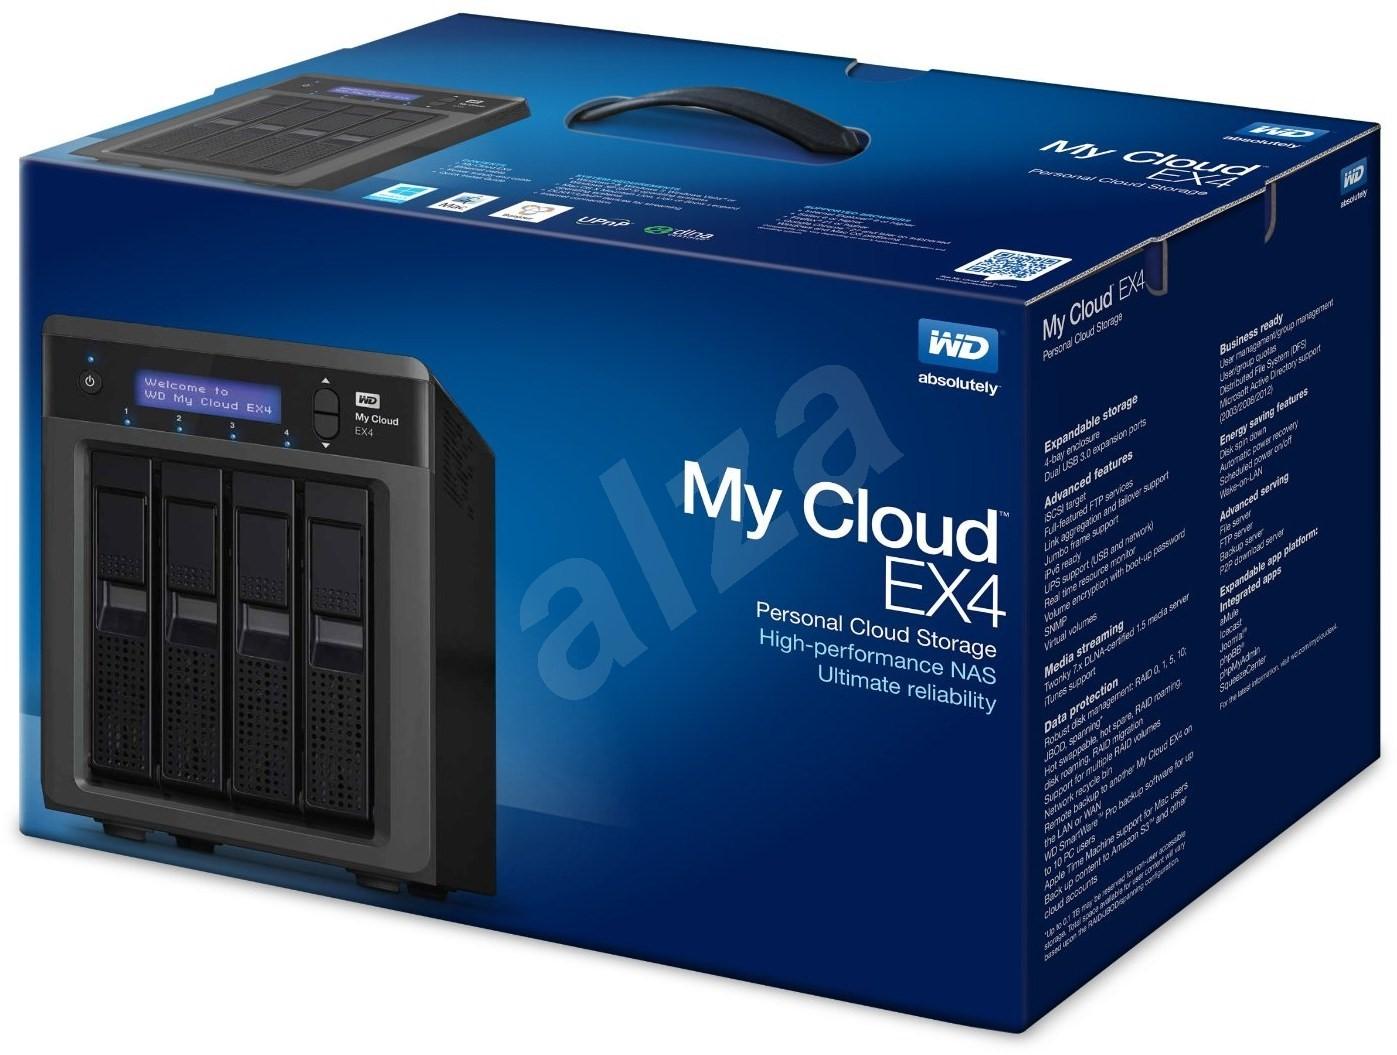 western digital my cloud ex4 8tb 4x 2tb data storage. Black Bedroom Furniture Sets. Home Design Ideas